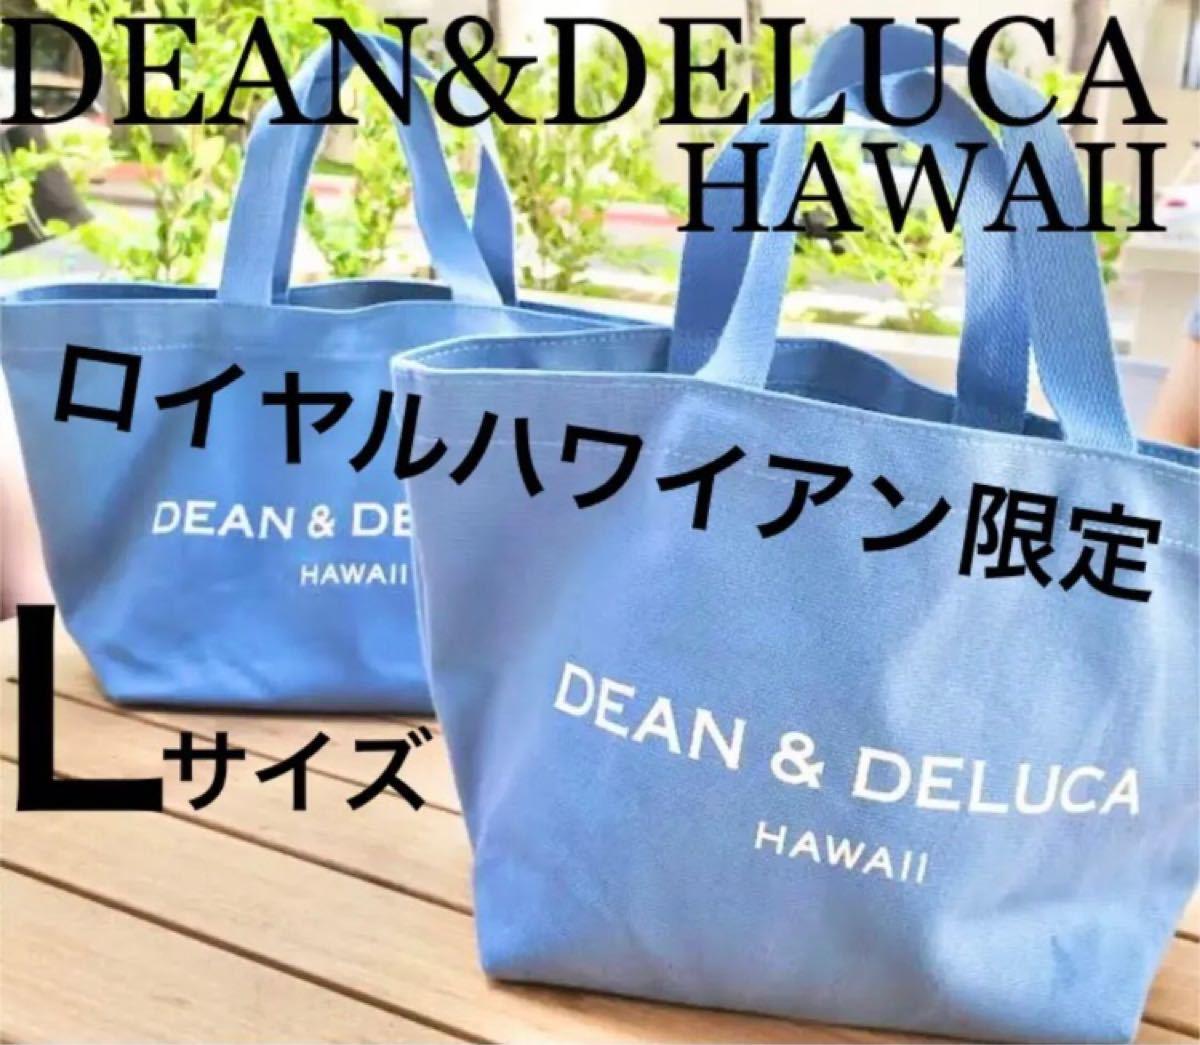 DEAN & DELUCA ロイヤルハワイアン限定 トートバッグ ディーン&デルーカ エコバッグ ハワイ限定 日本未発売 大容量